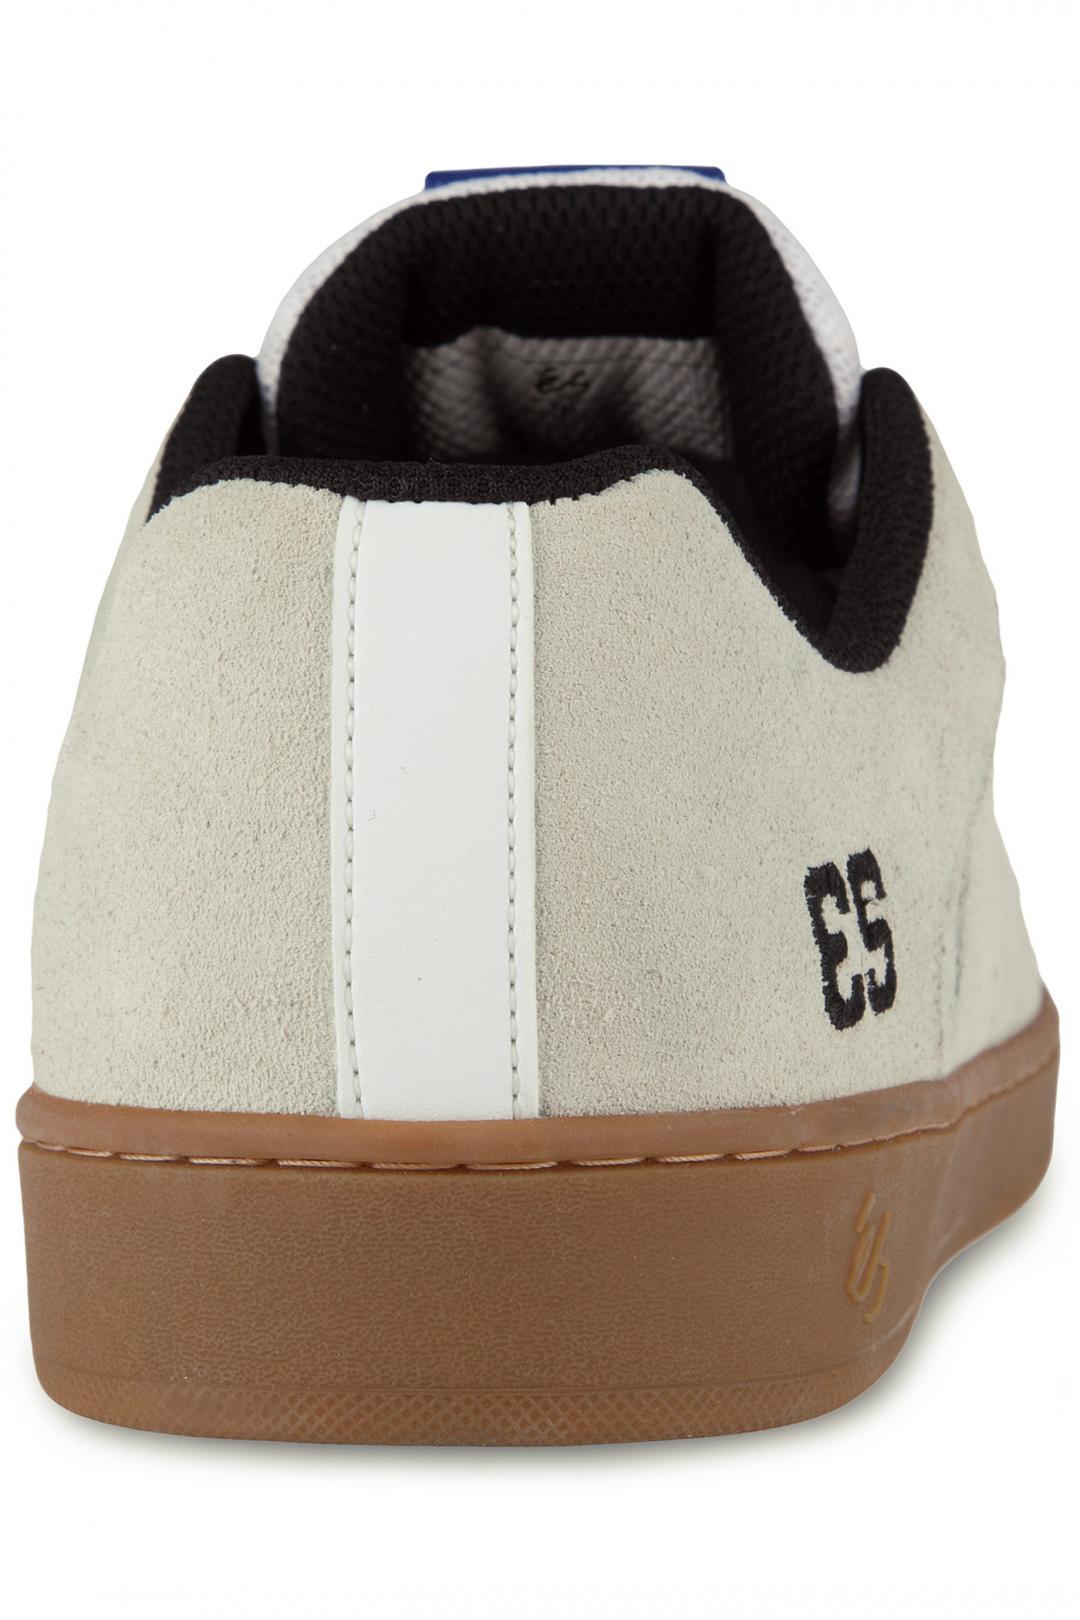 Uomo éS SAL white gum | Sneaker